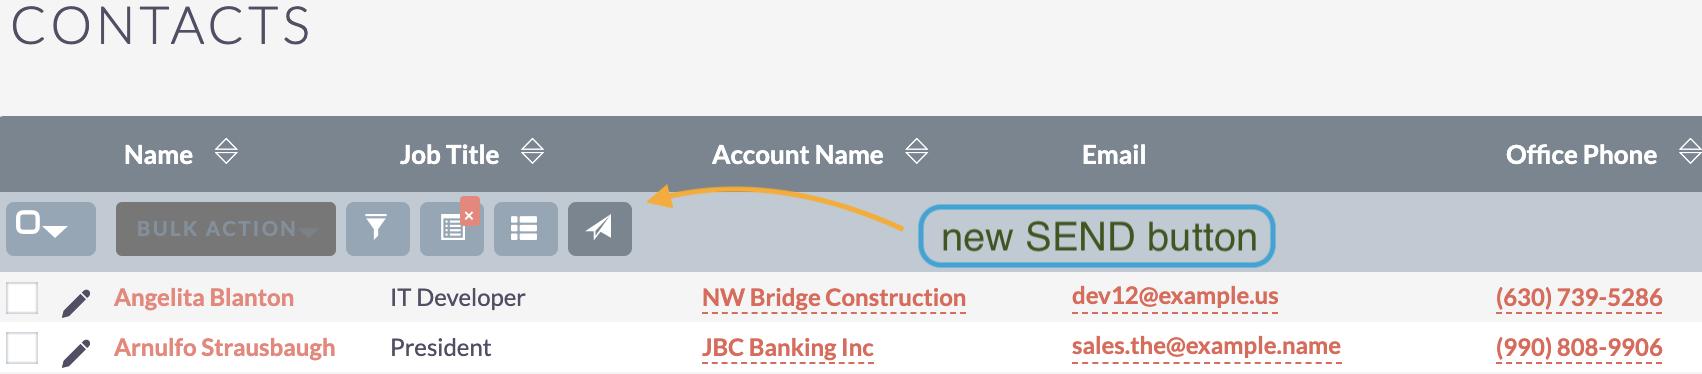 Screenshot showing the new button